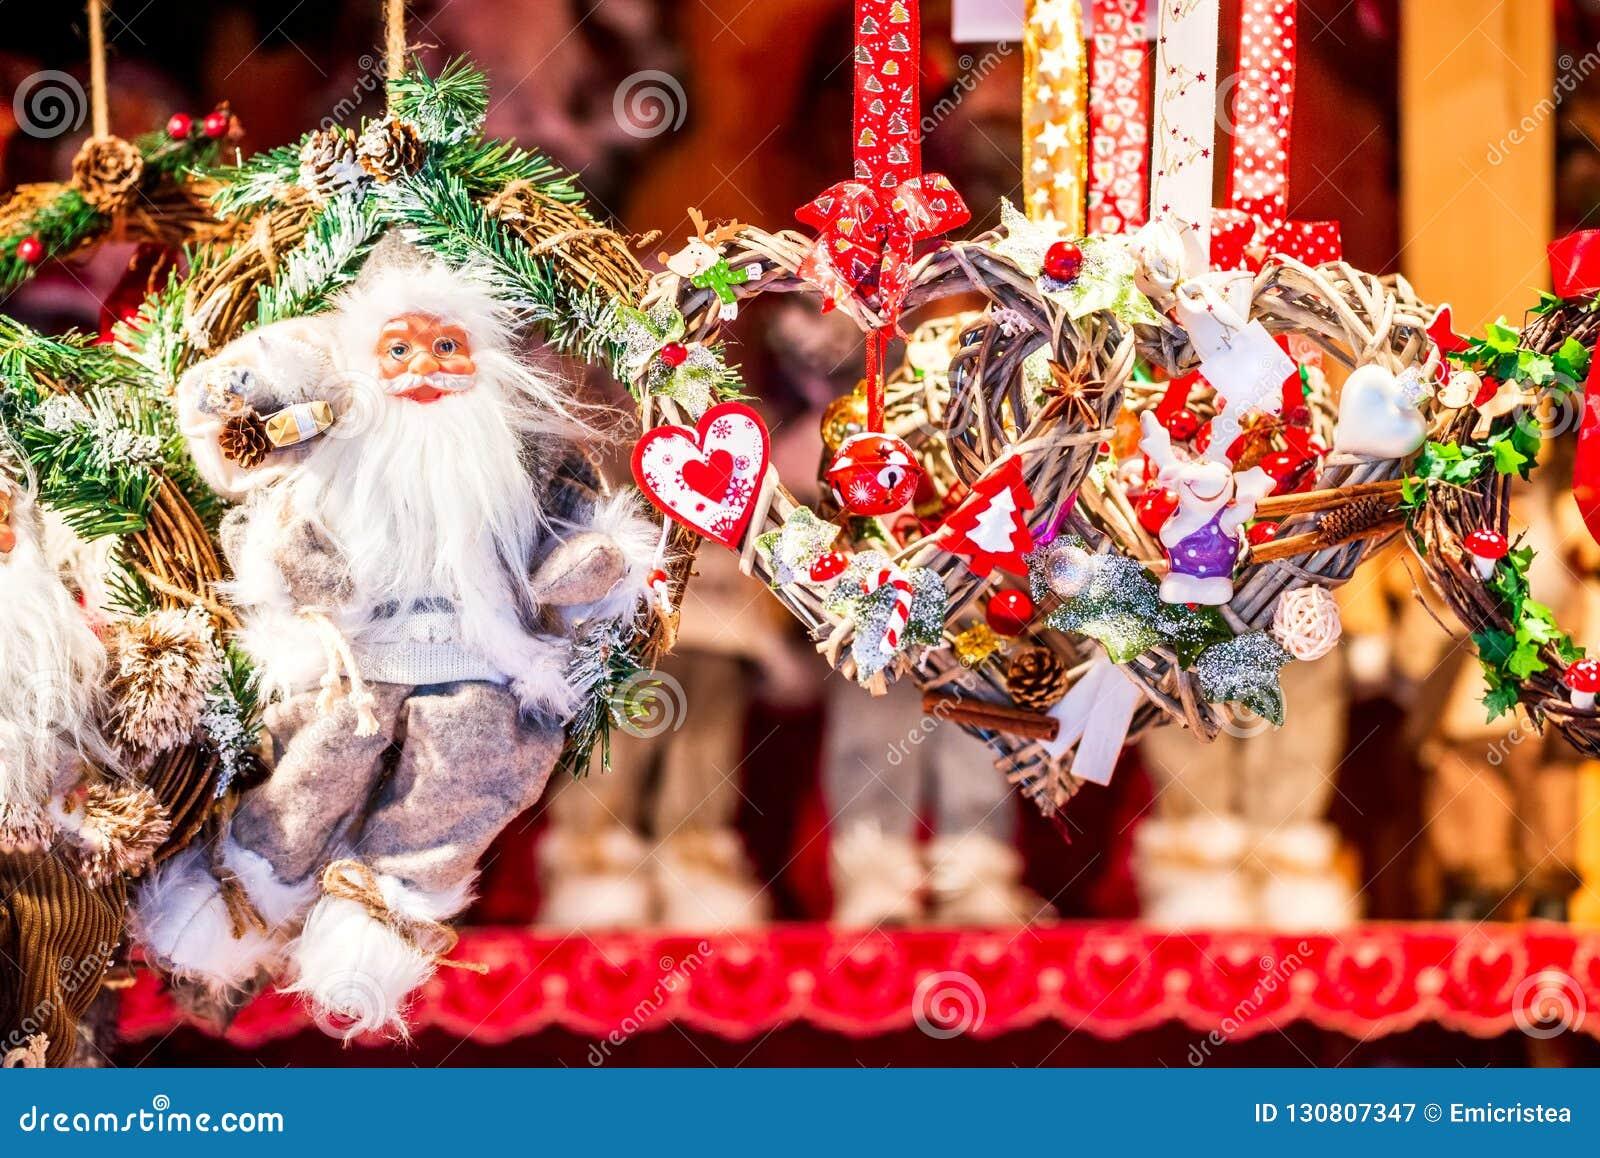 Christmas In France Decorations.Strasbourg Christmas Market France Stock Image Image Of